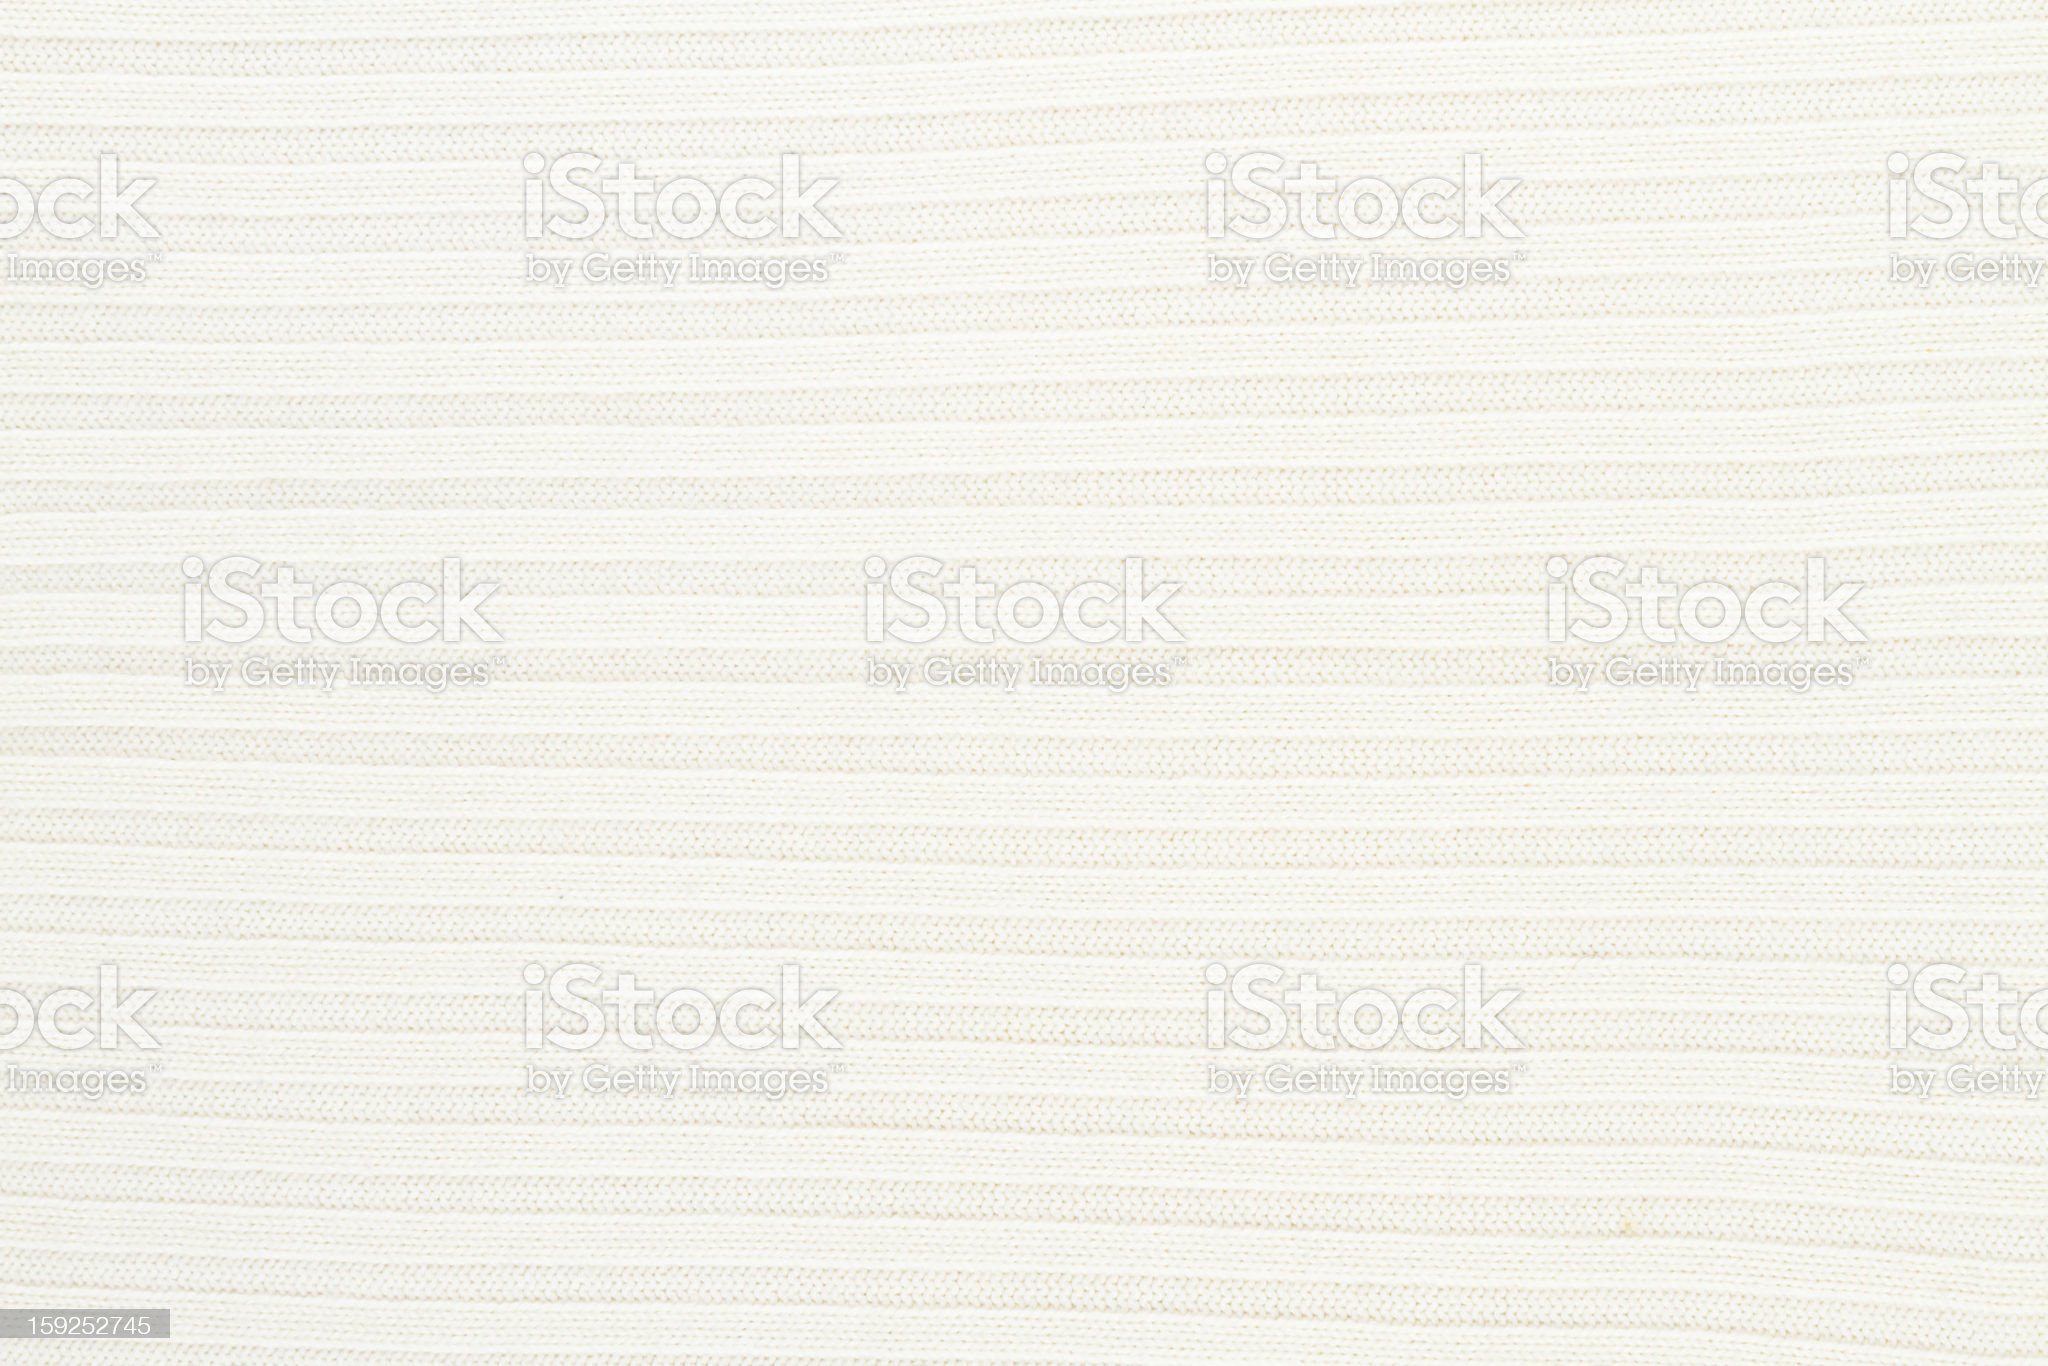 jersey royalty-free stock photo